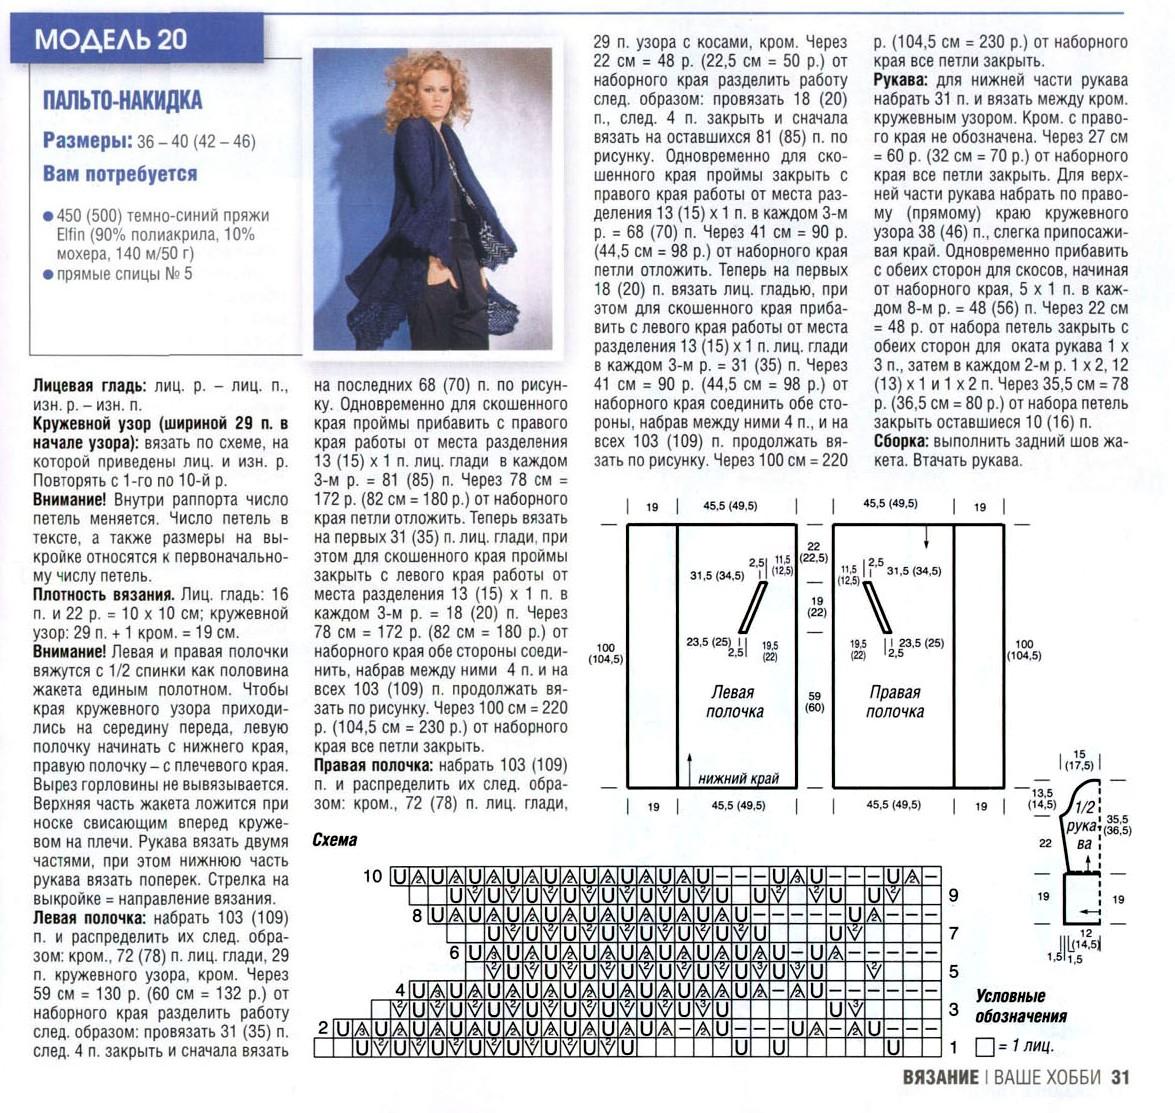 КАРДИГАН СПИЦАМИ ЗИНАИДА ИВАНОВНА Простые схемы 68